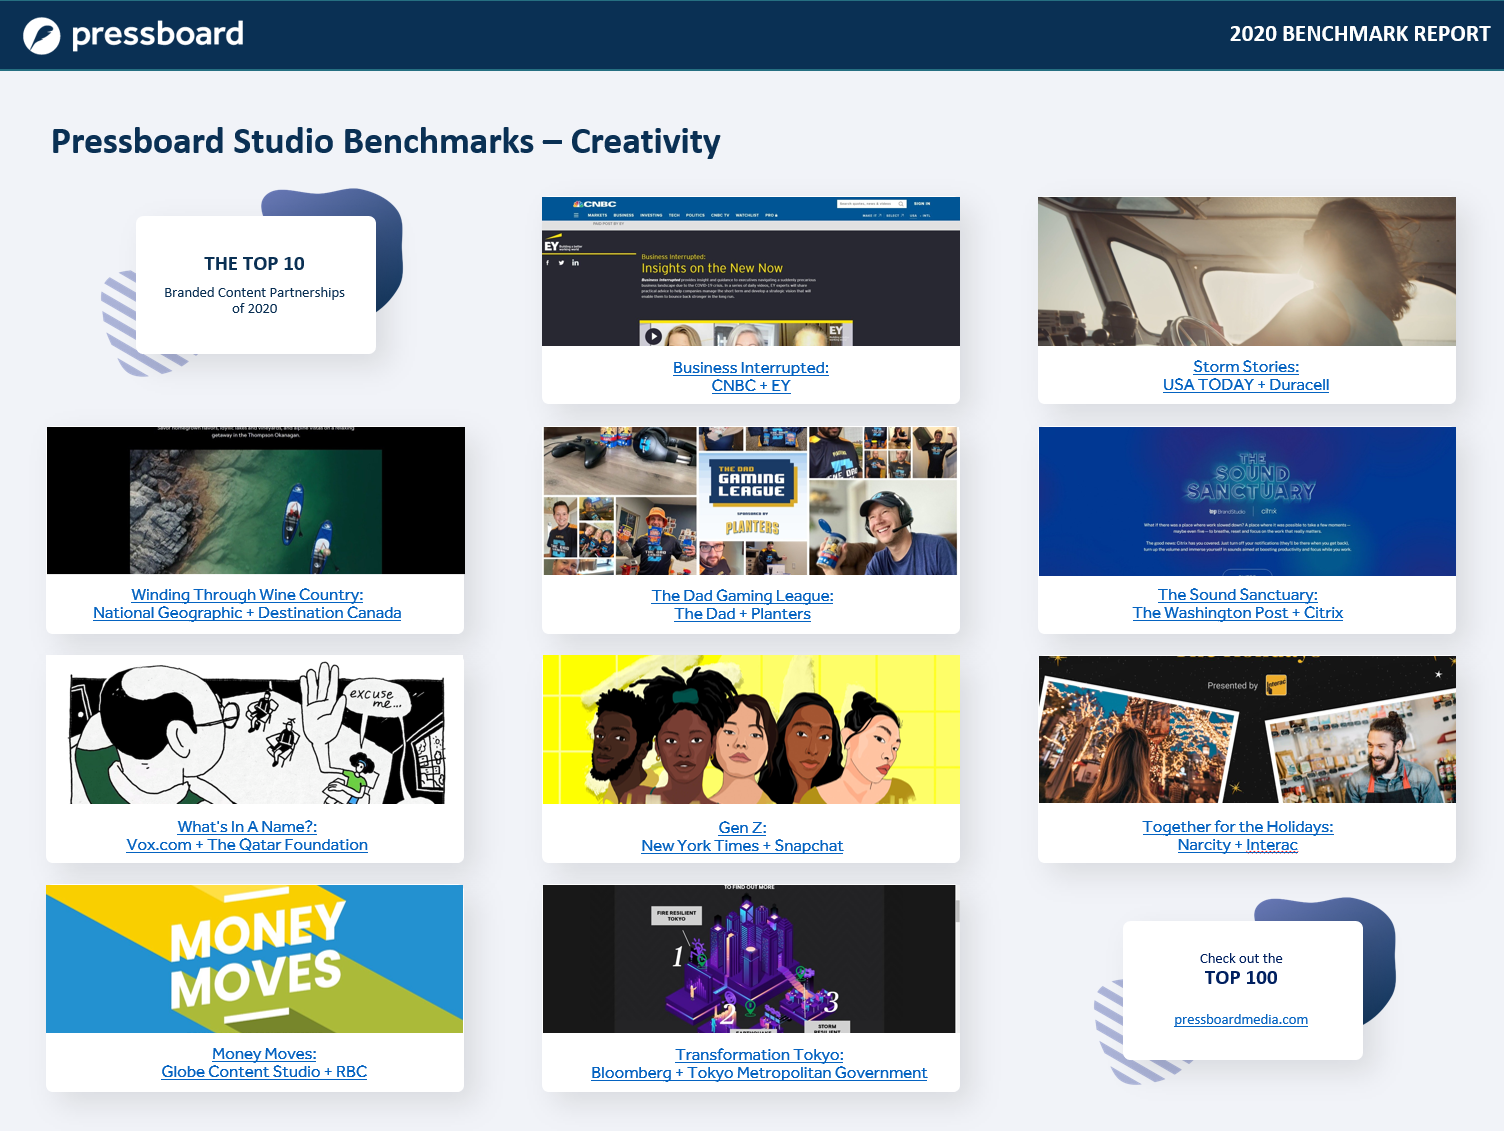 Pressboard Benchmark Report - 2020 - Creativity page